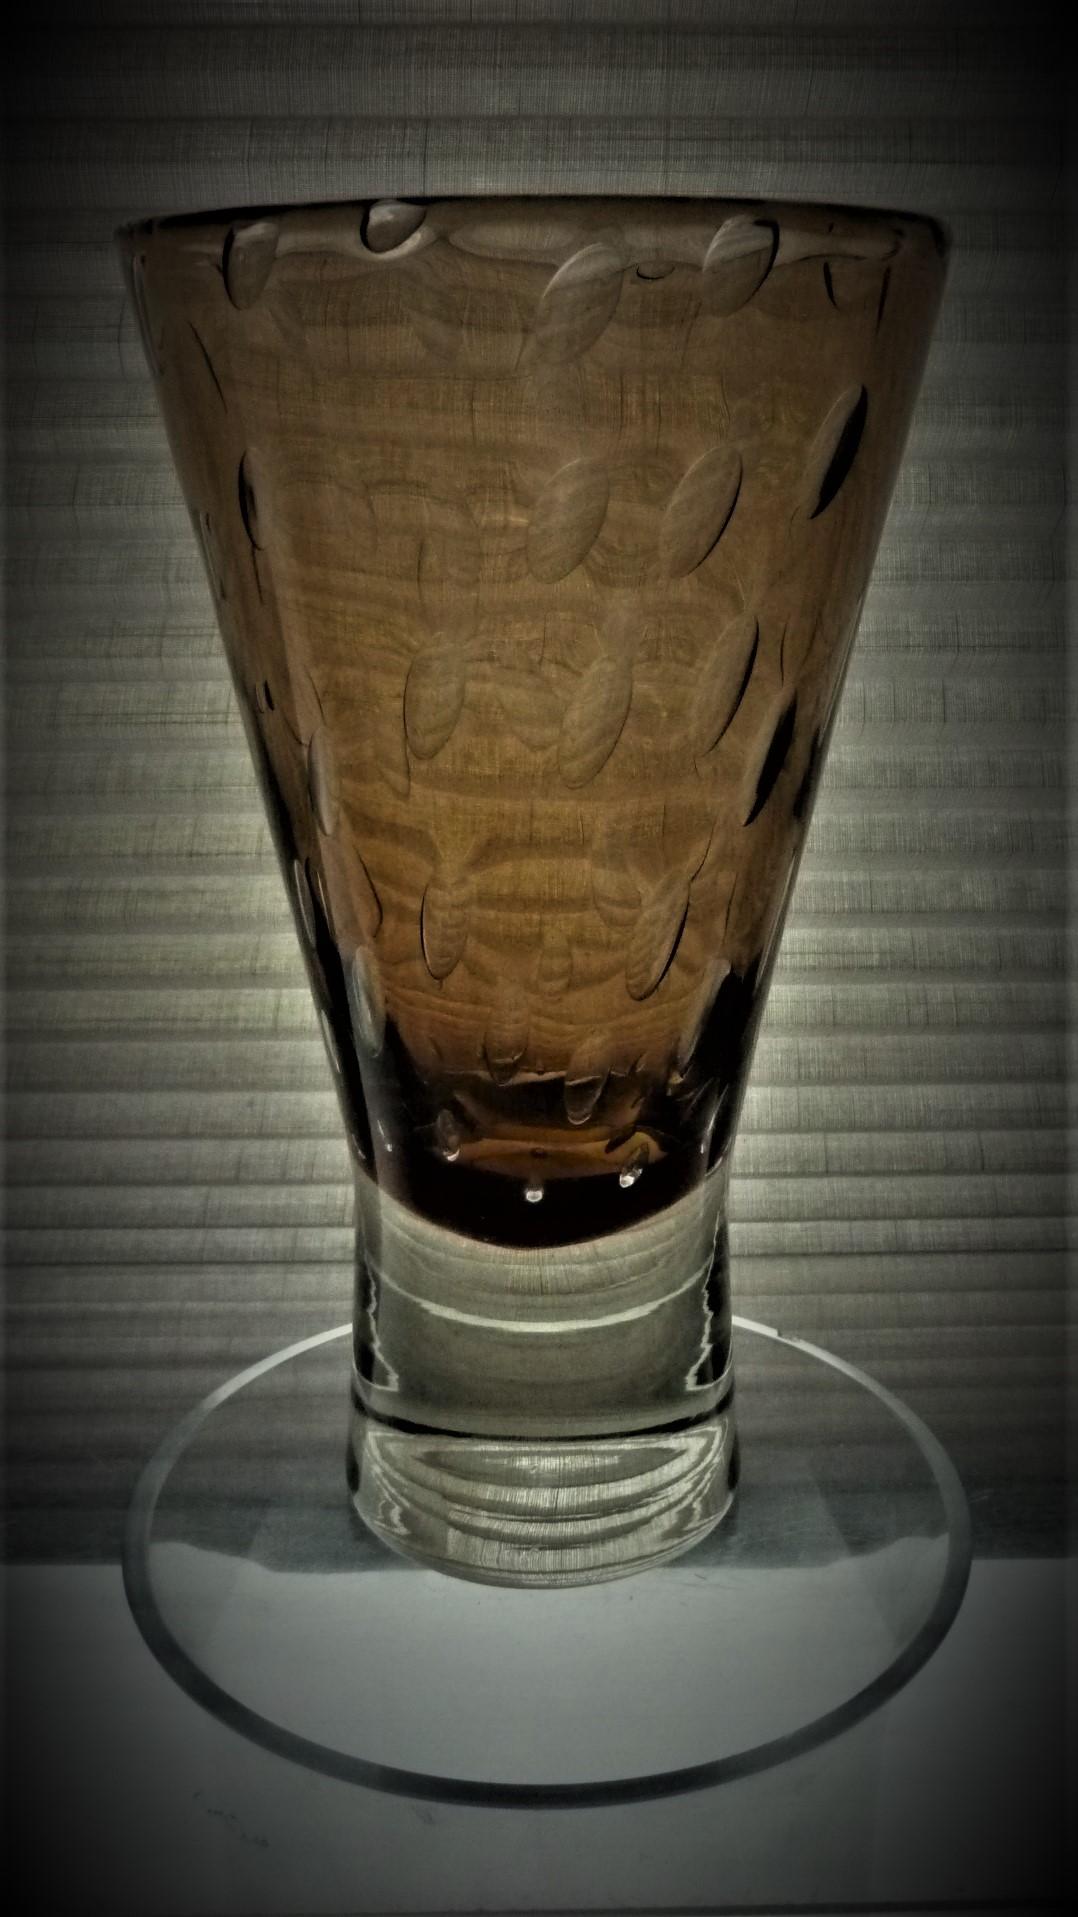 1960s vintage Harrachov Glass vase designed by Milan Metelak.